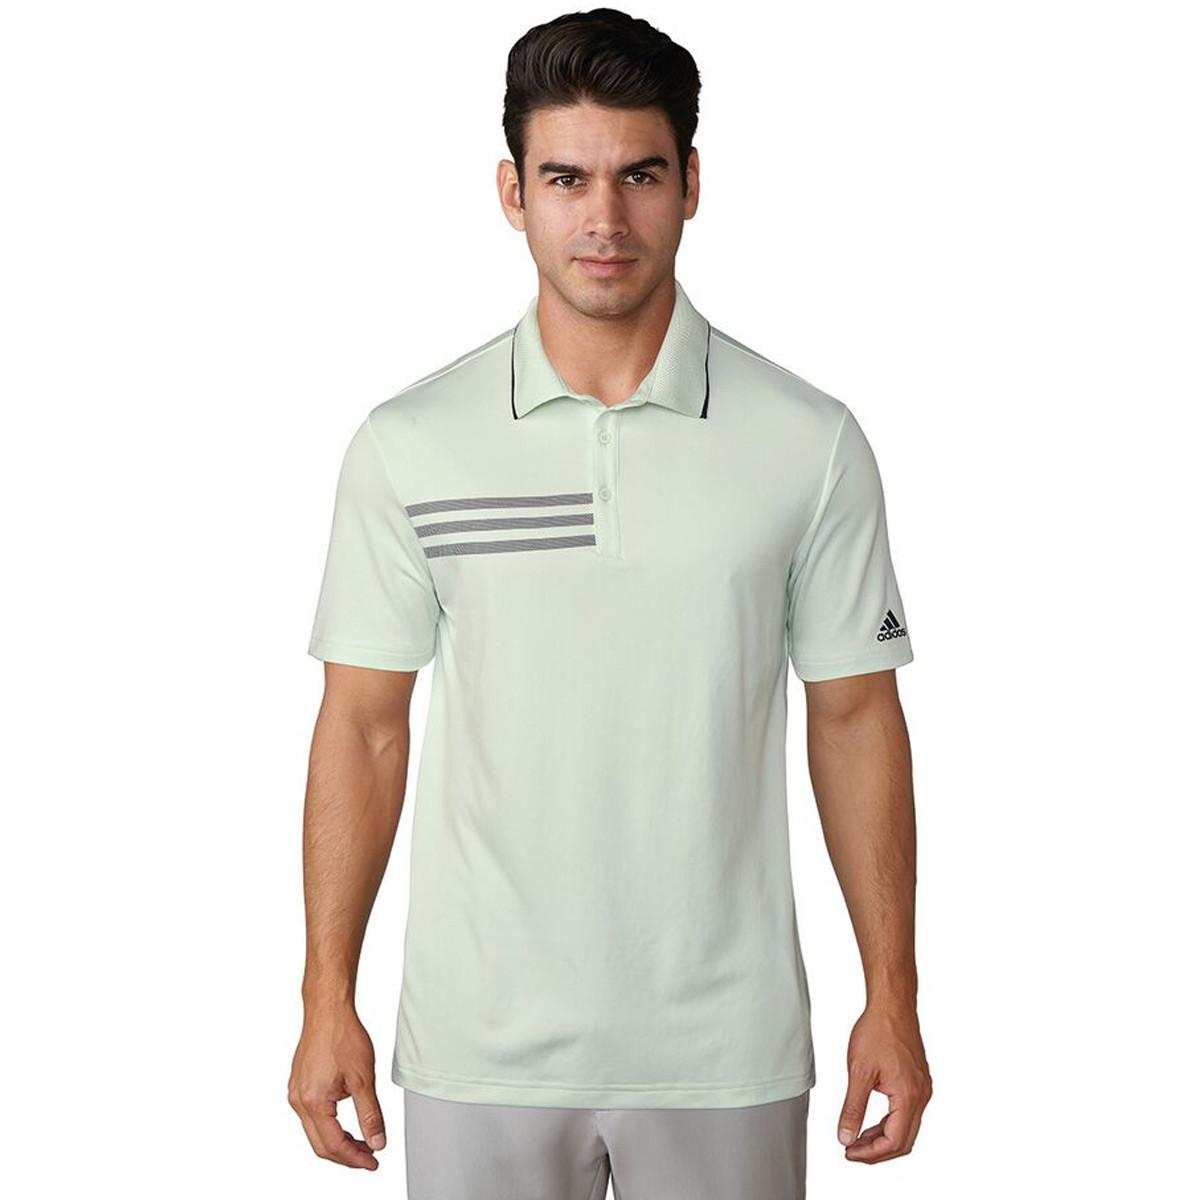 1fd1fcc88e1f adidas Golf Mens 3-Stripes Mesh Collar Polo Shirt